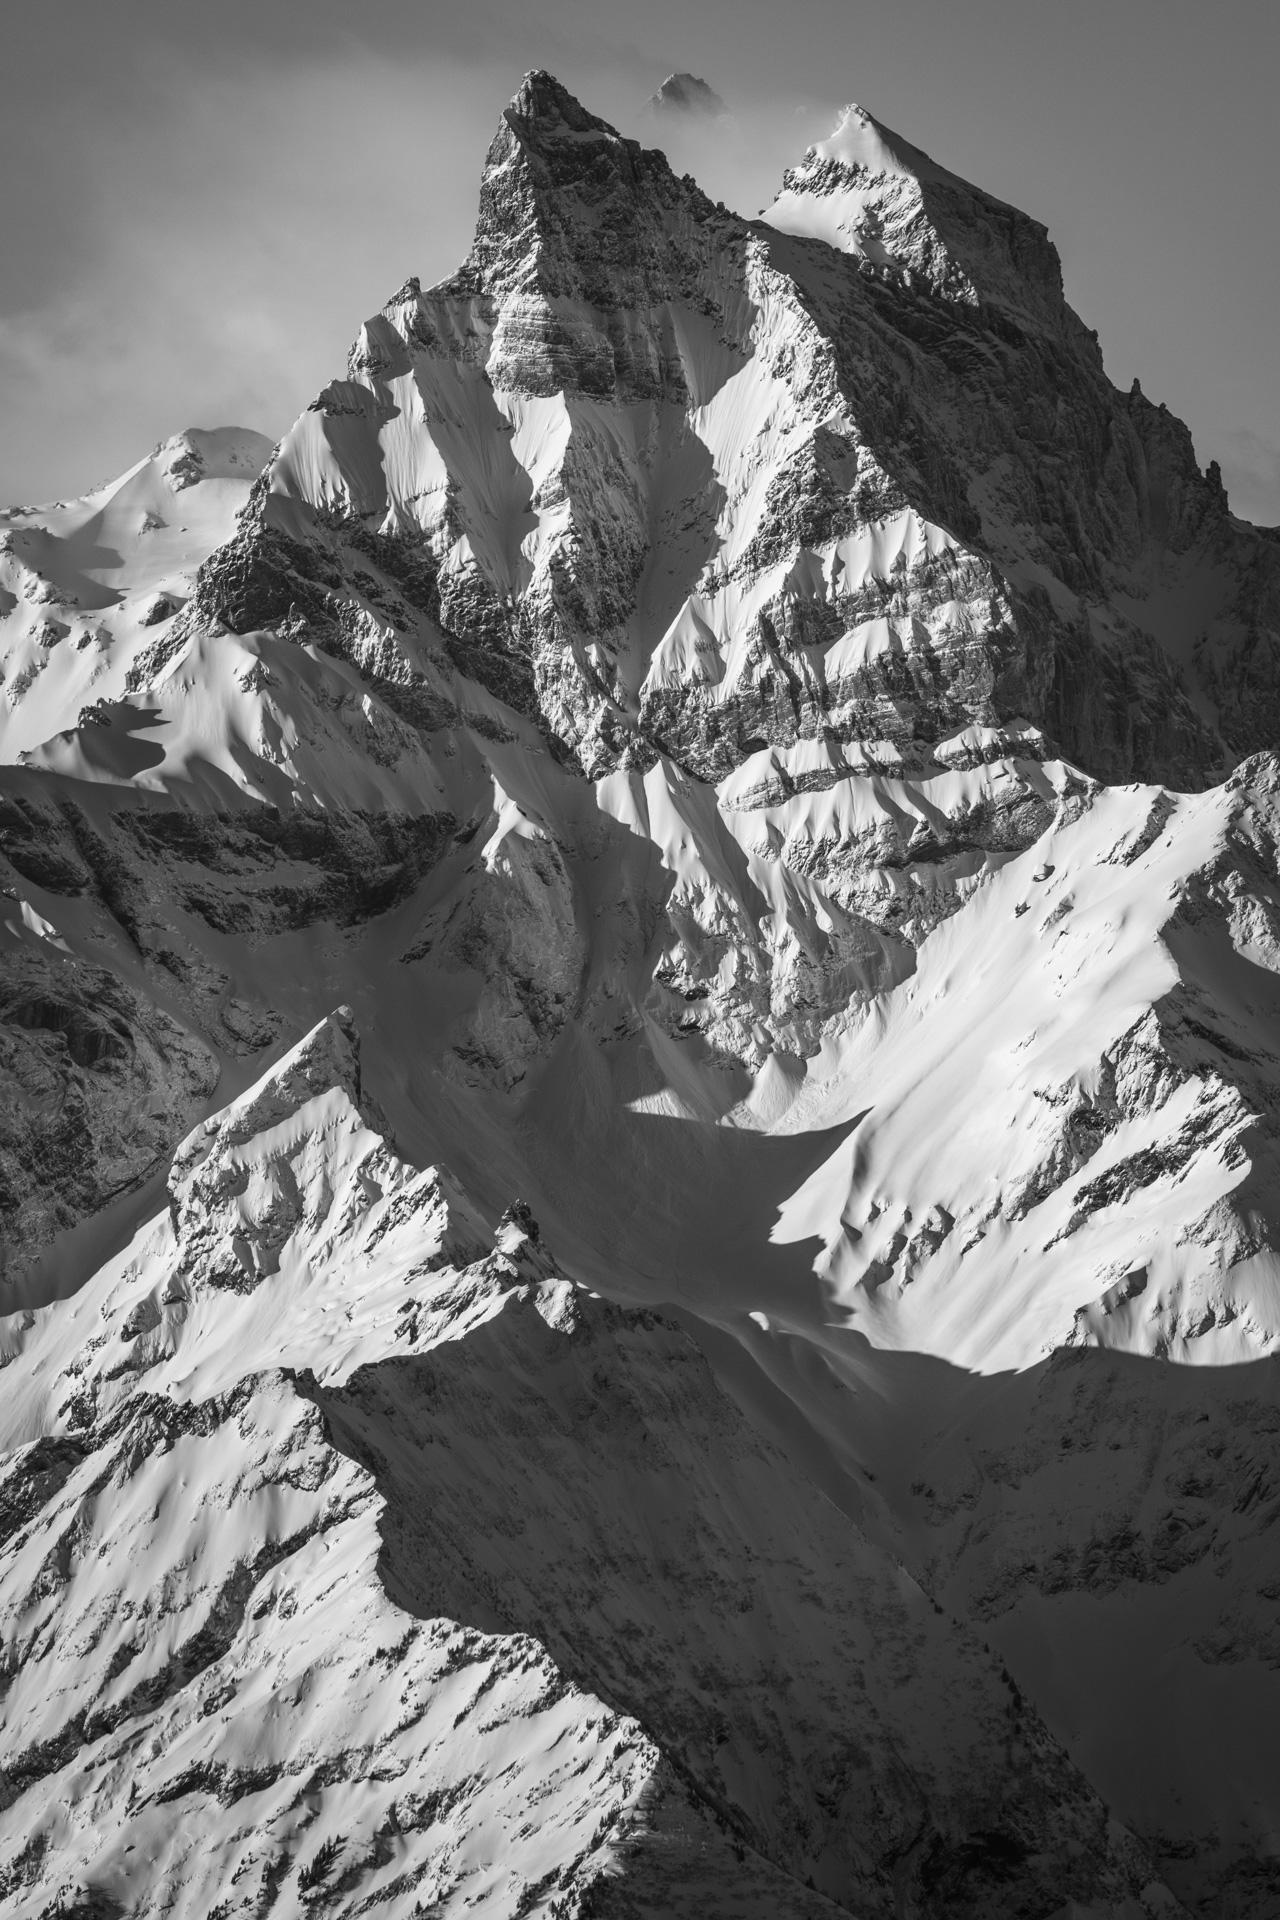 montagne photo - photo montagne grand format - cadre photo montagne noir et blanc - photo montagne alpes